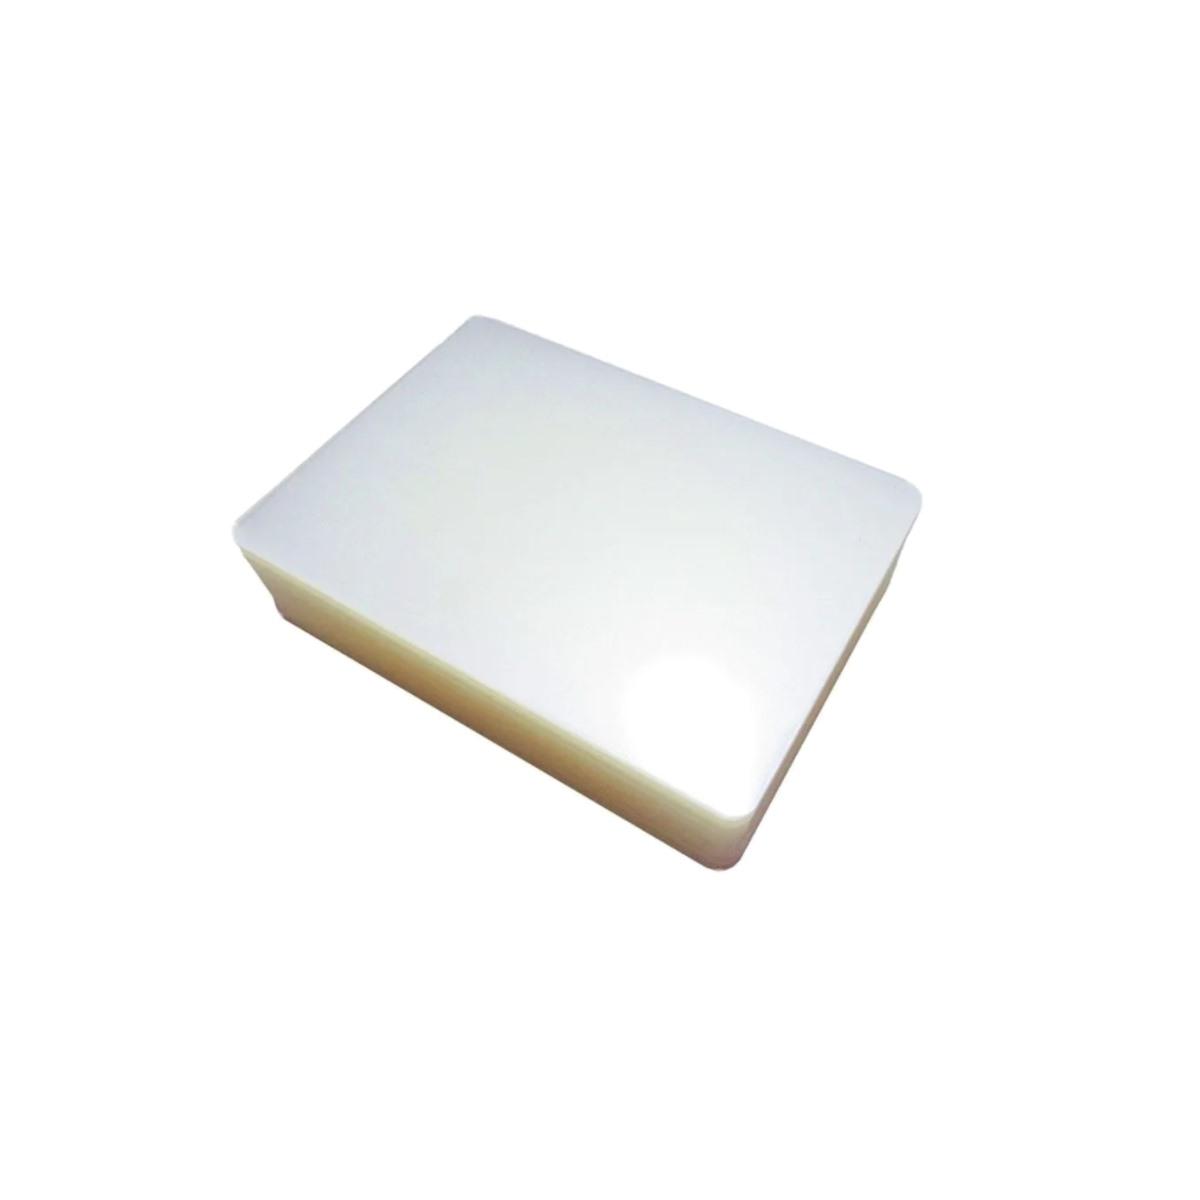 Polaseal plástico para plastificação Ofício II 222x336 0,10mm 100un